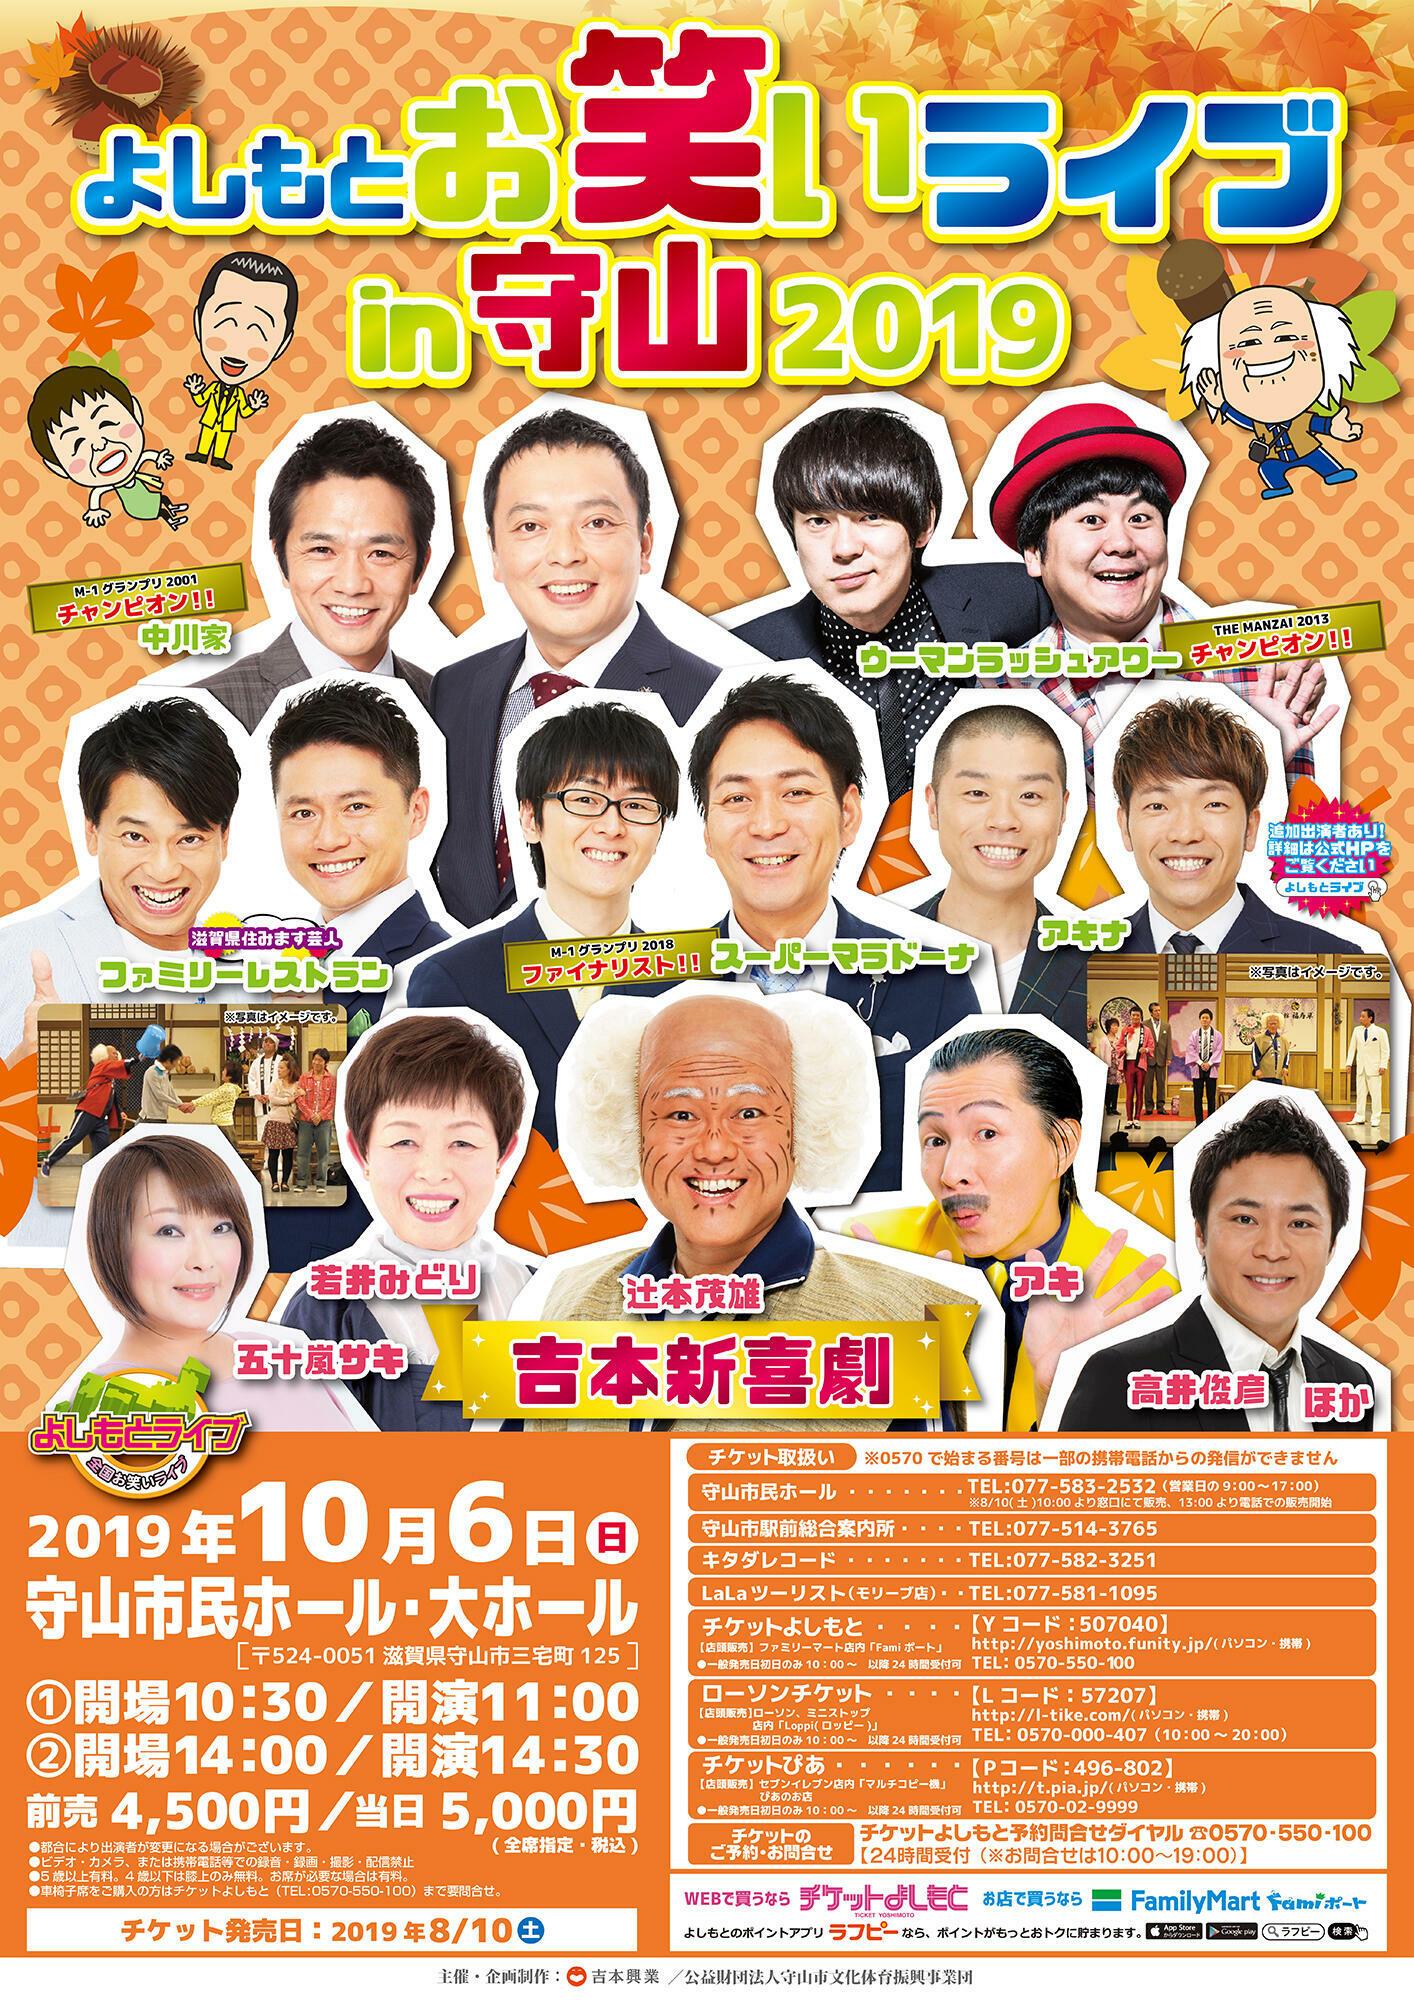 http://www.syumatsu.jp/20190809110559-63d65134db2b3232c7b09468f516cbc8bed528c1.jpg